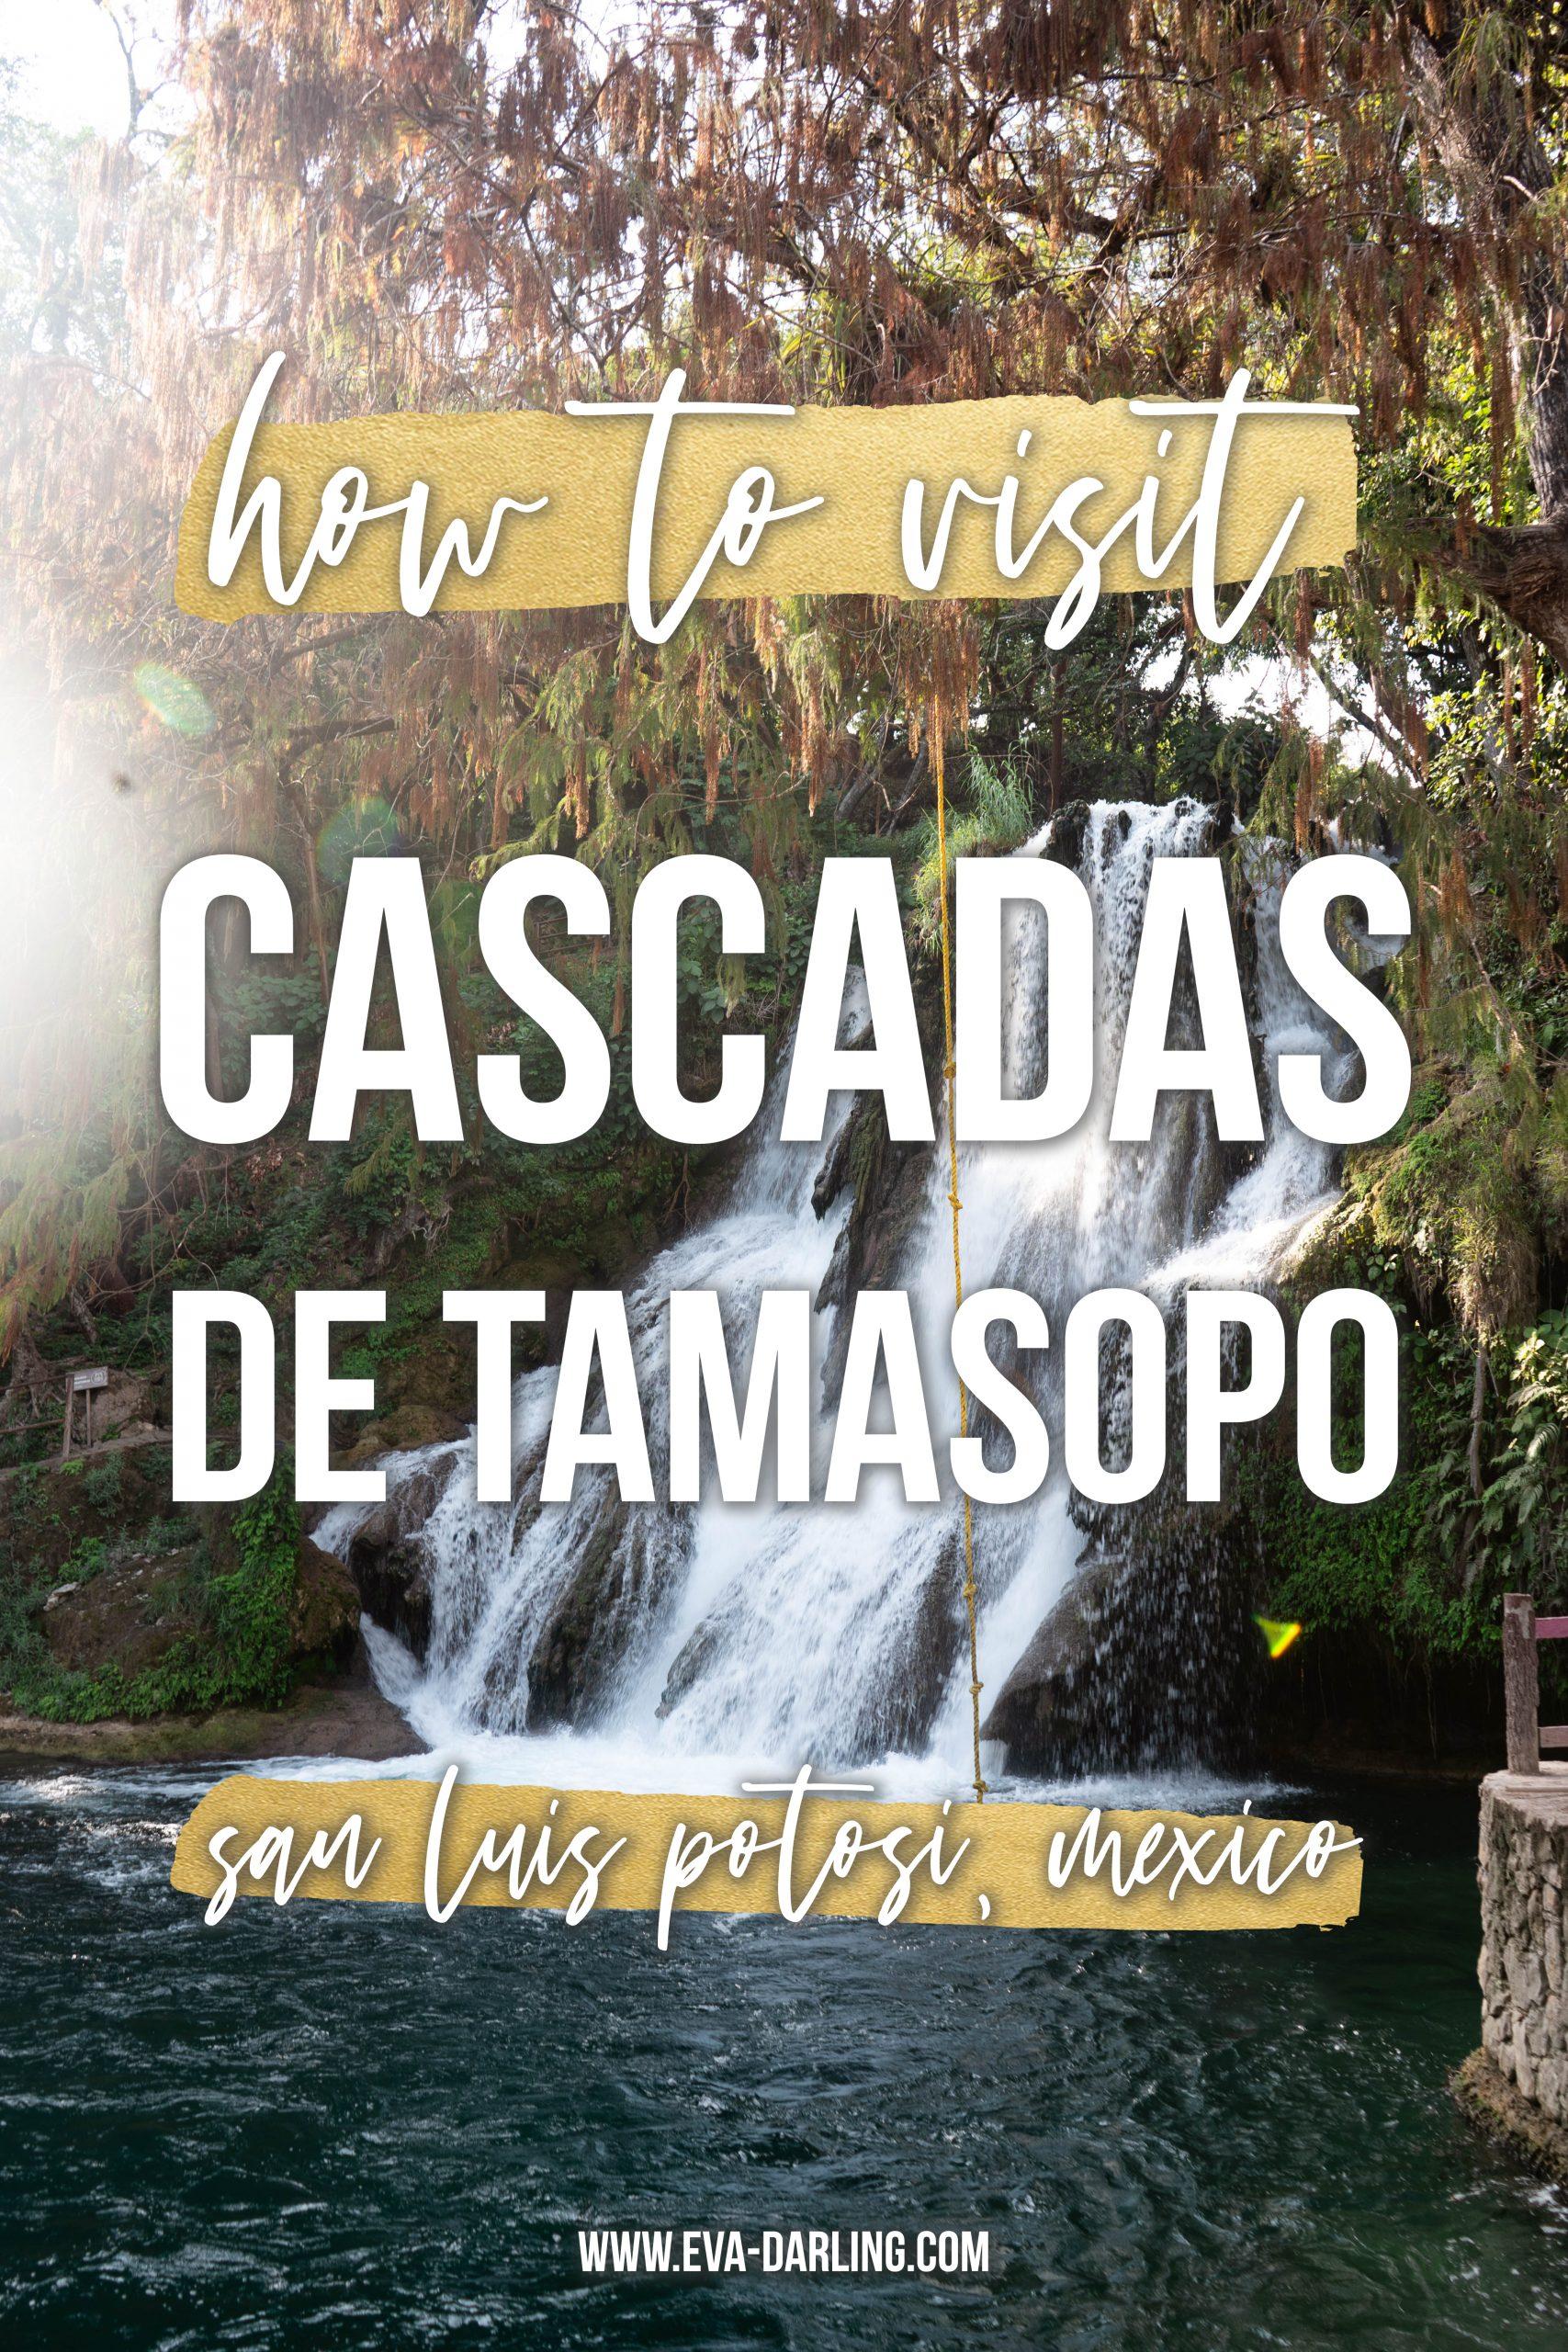 how to visit cascadas de tamasopo best things to do la huasteca potosina san luis potosi mexico waterfall adventure travel swimming what to know before going